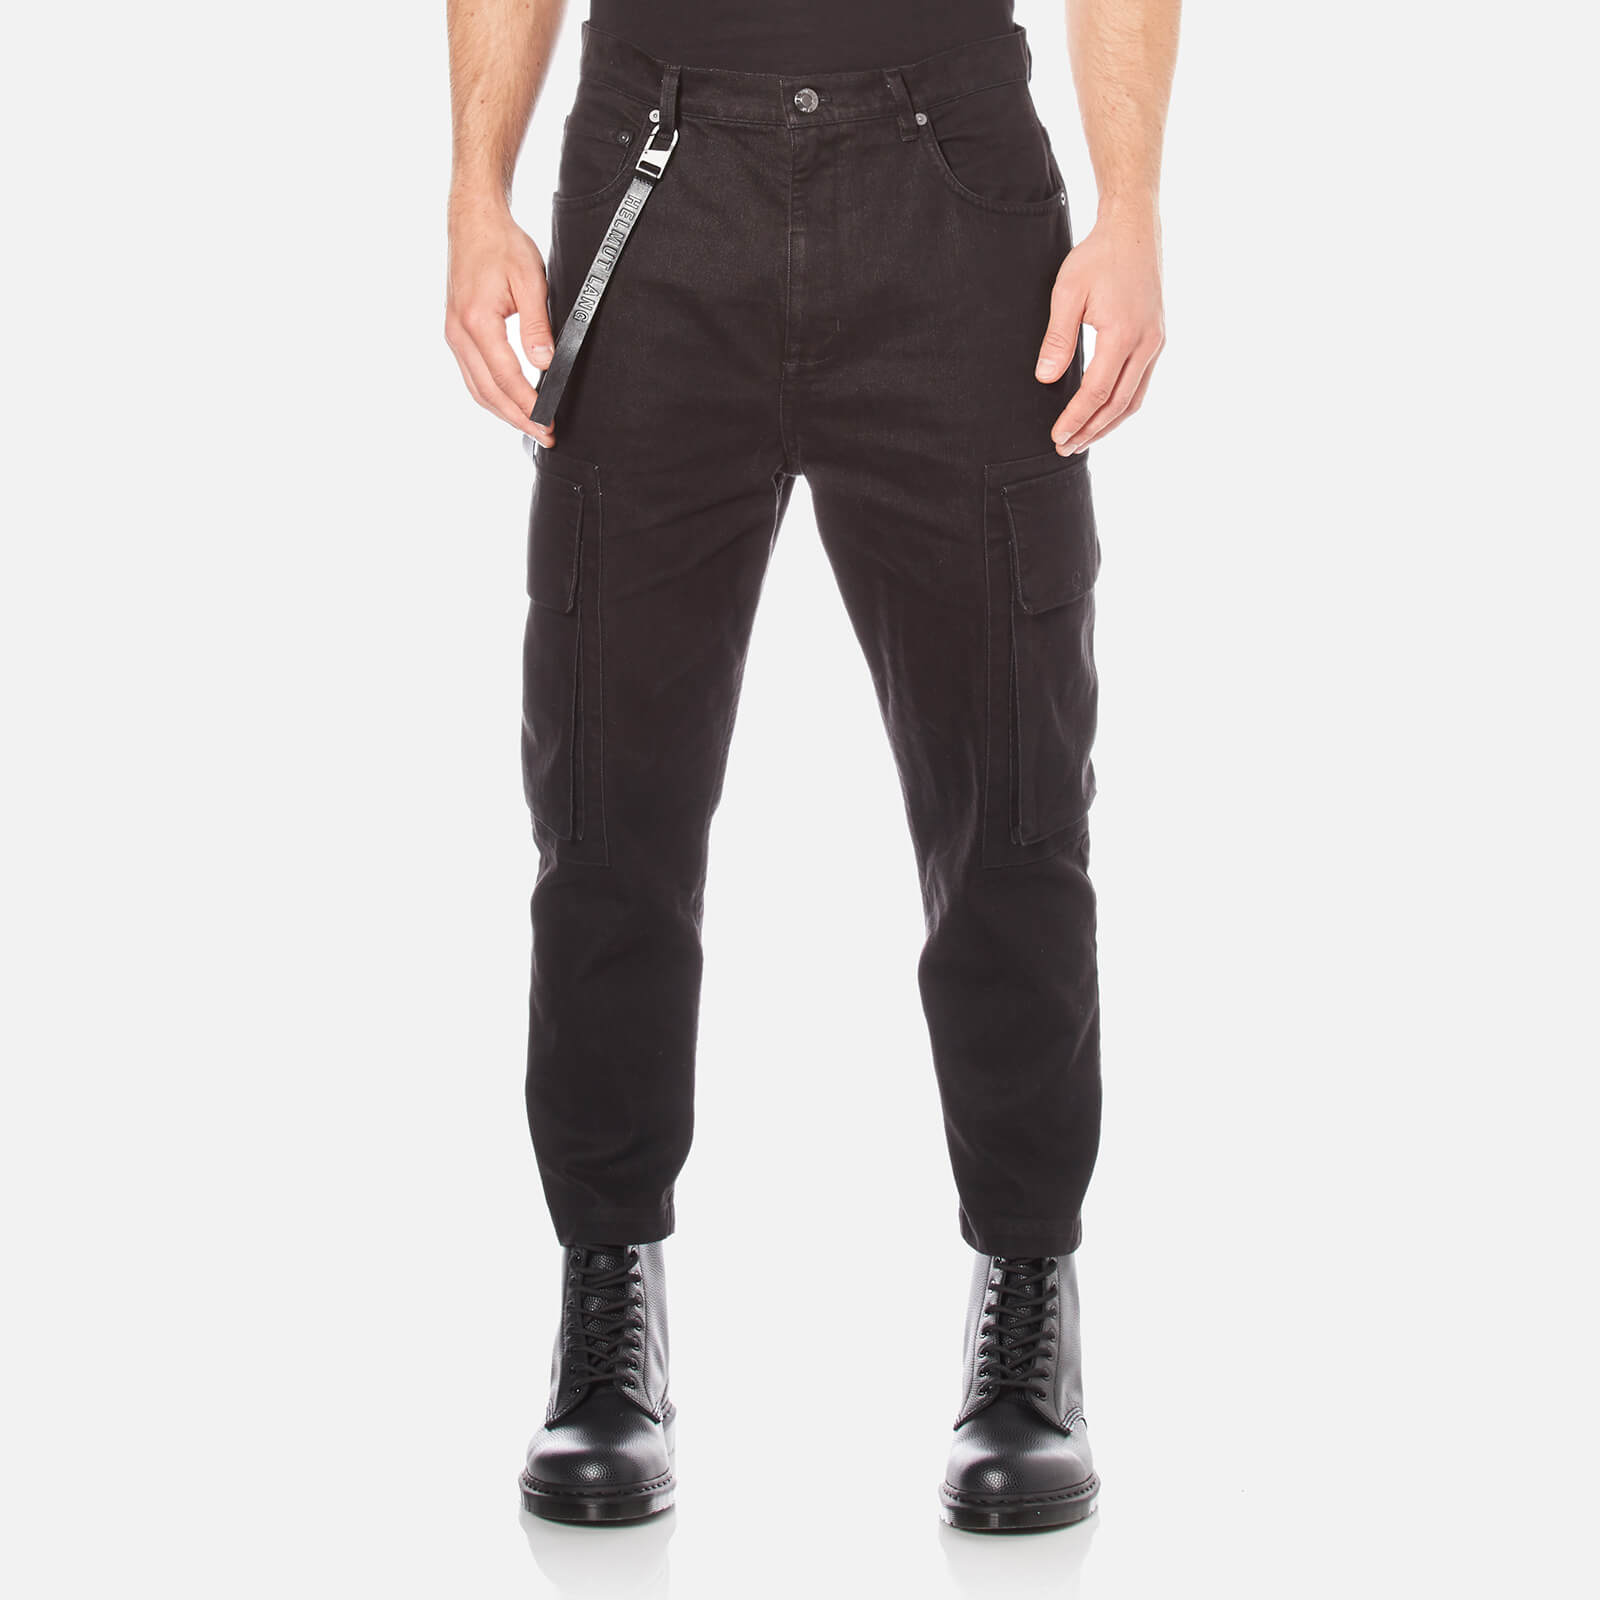 45230142 Helmut Lang Men's Cropped Cargo Jeans - Black - Free UK Delivery over £50